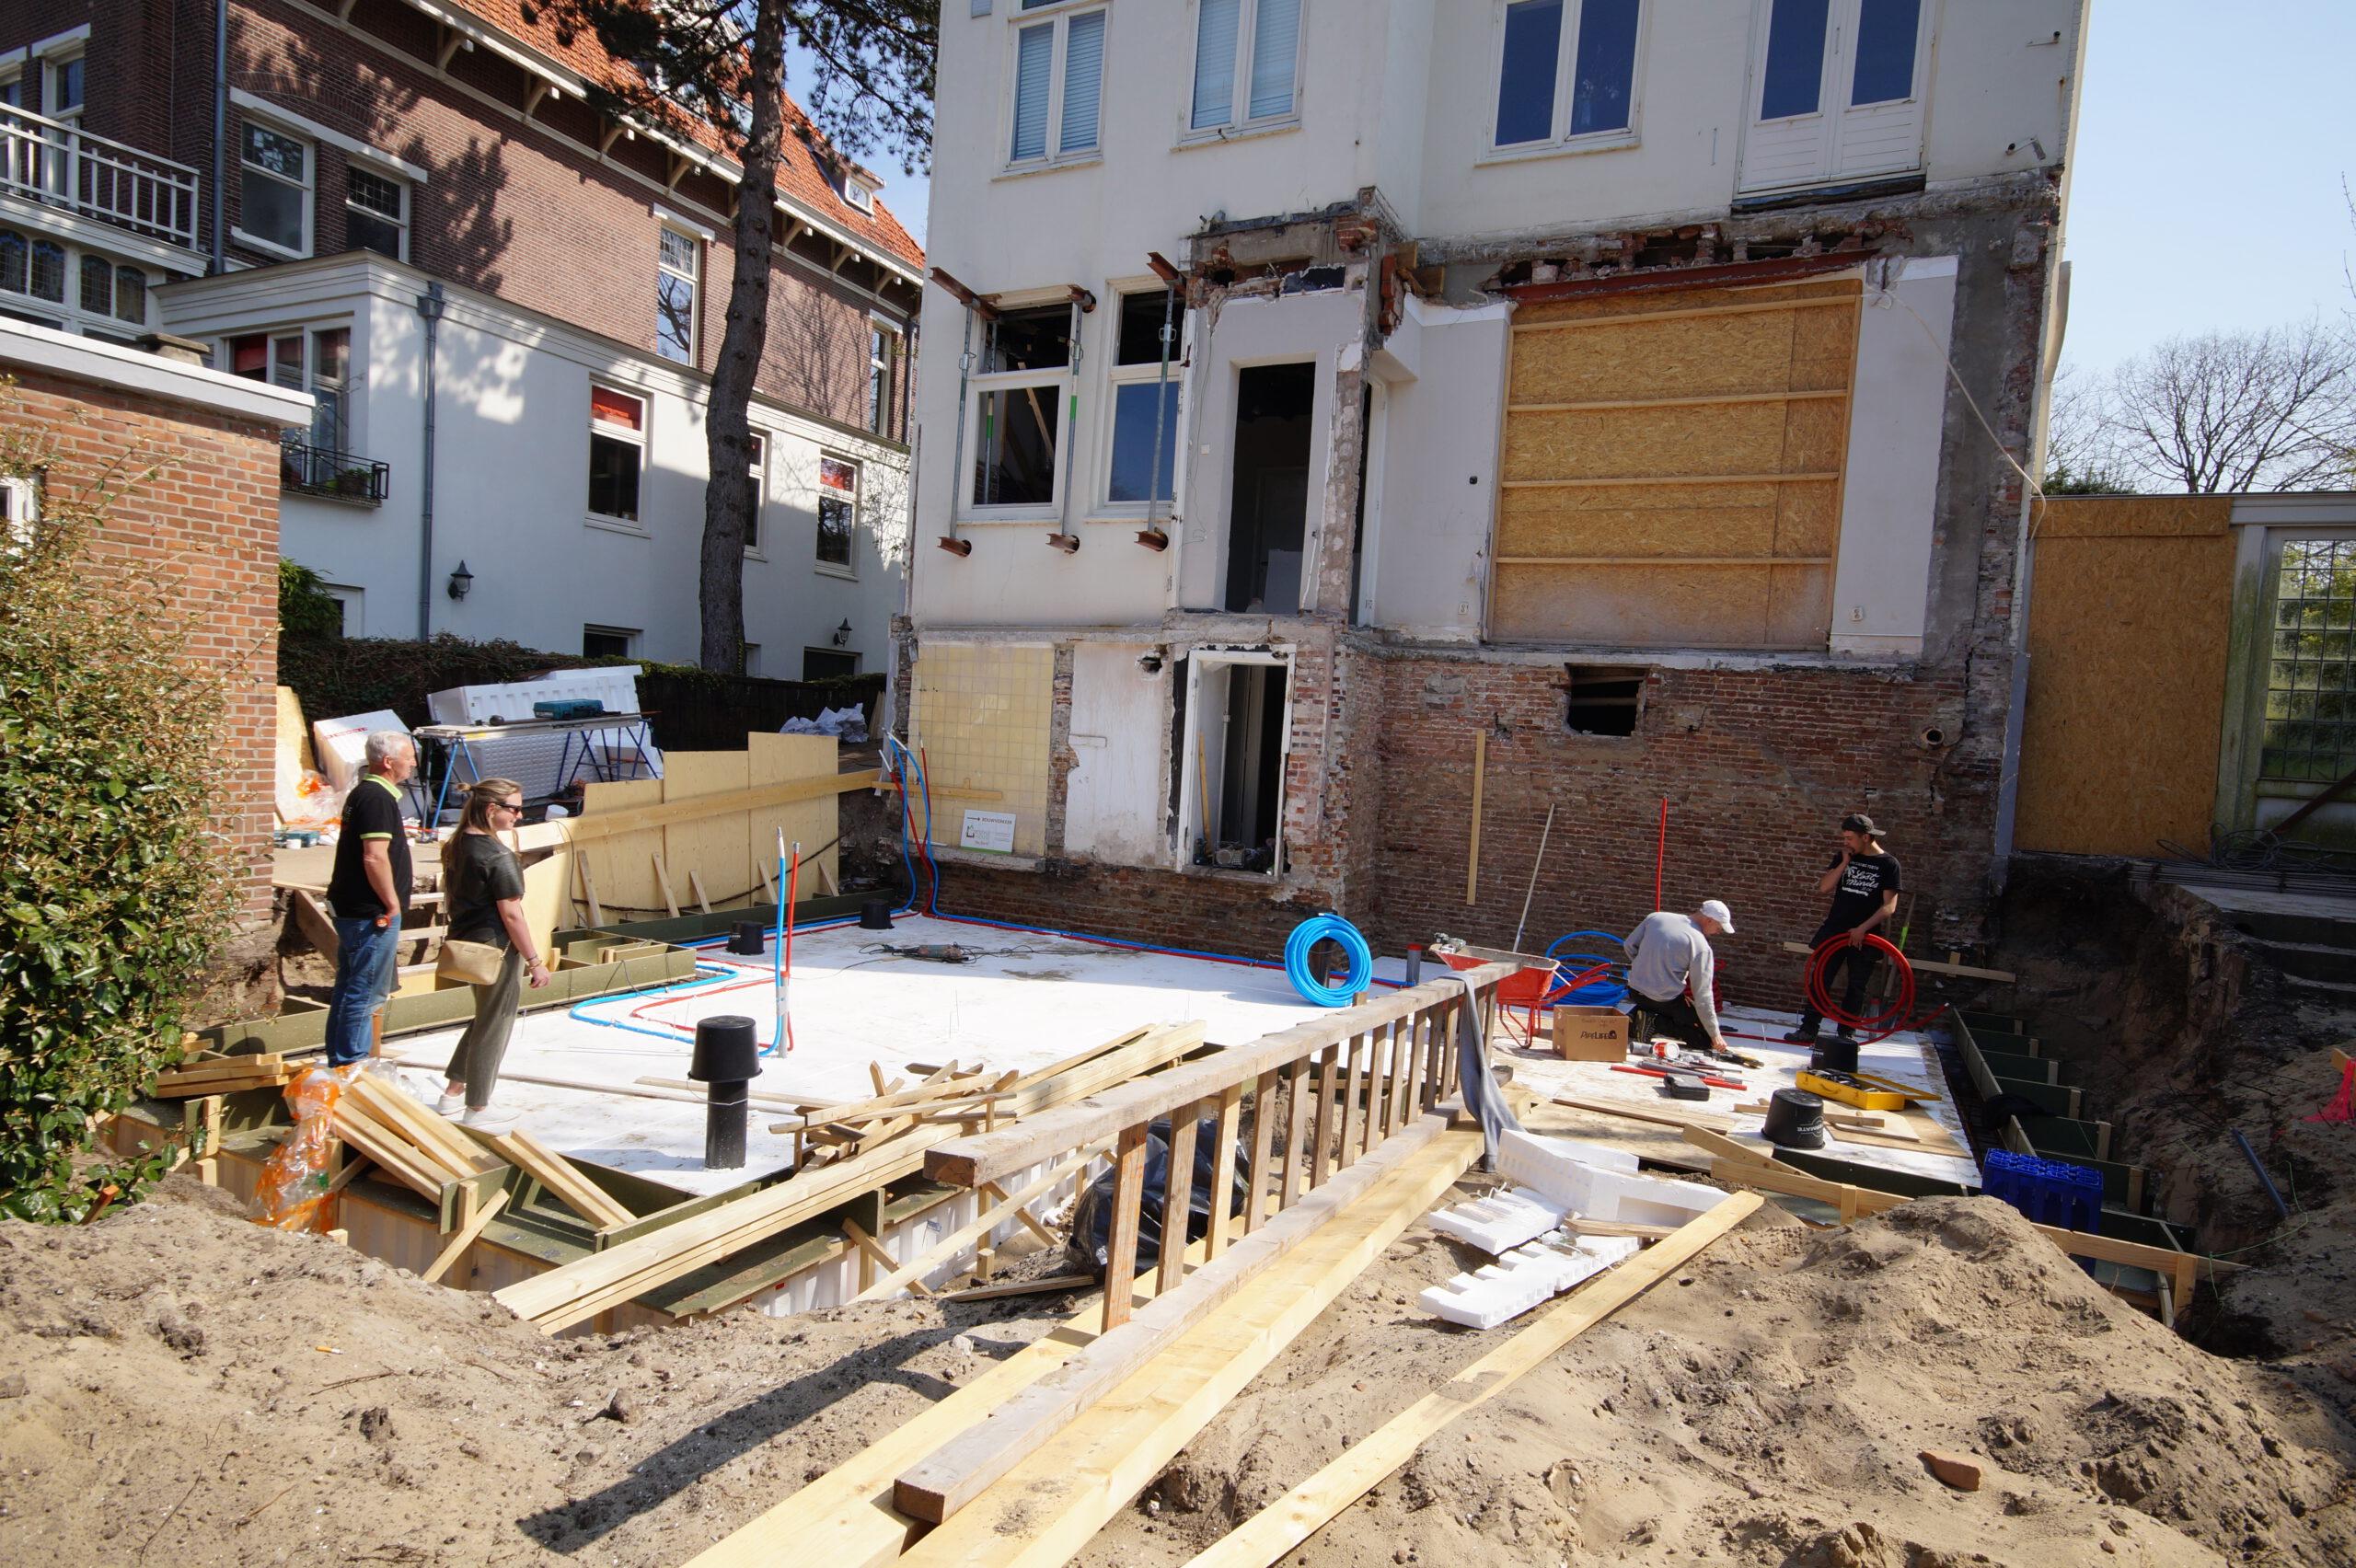 Verbouwing woning aan het van Stolkpark Den Haag